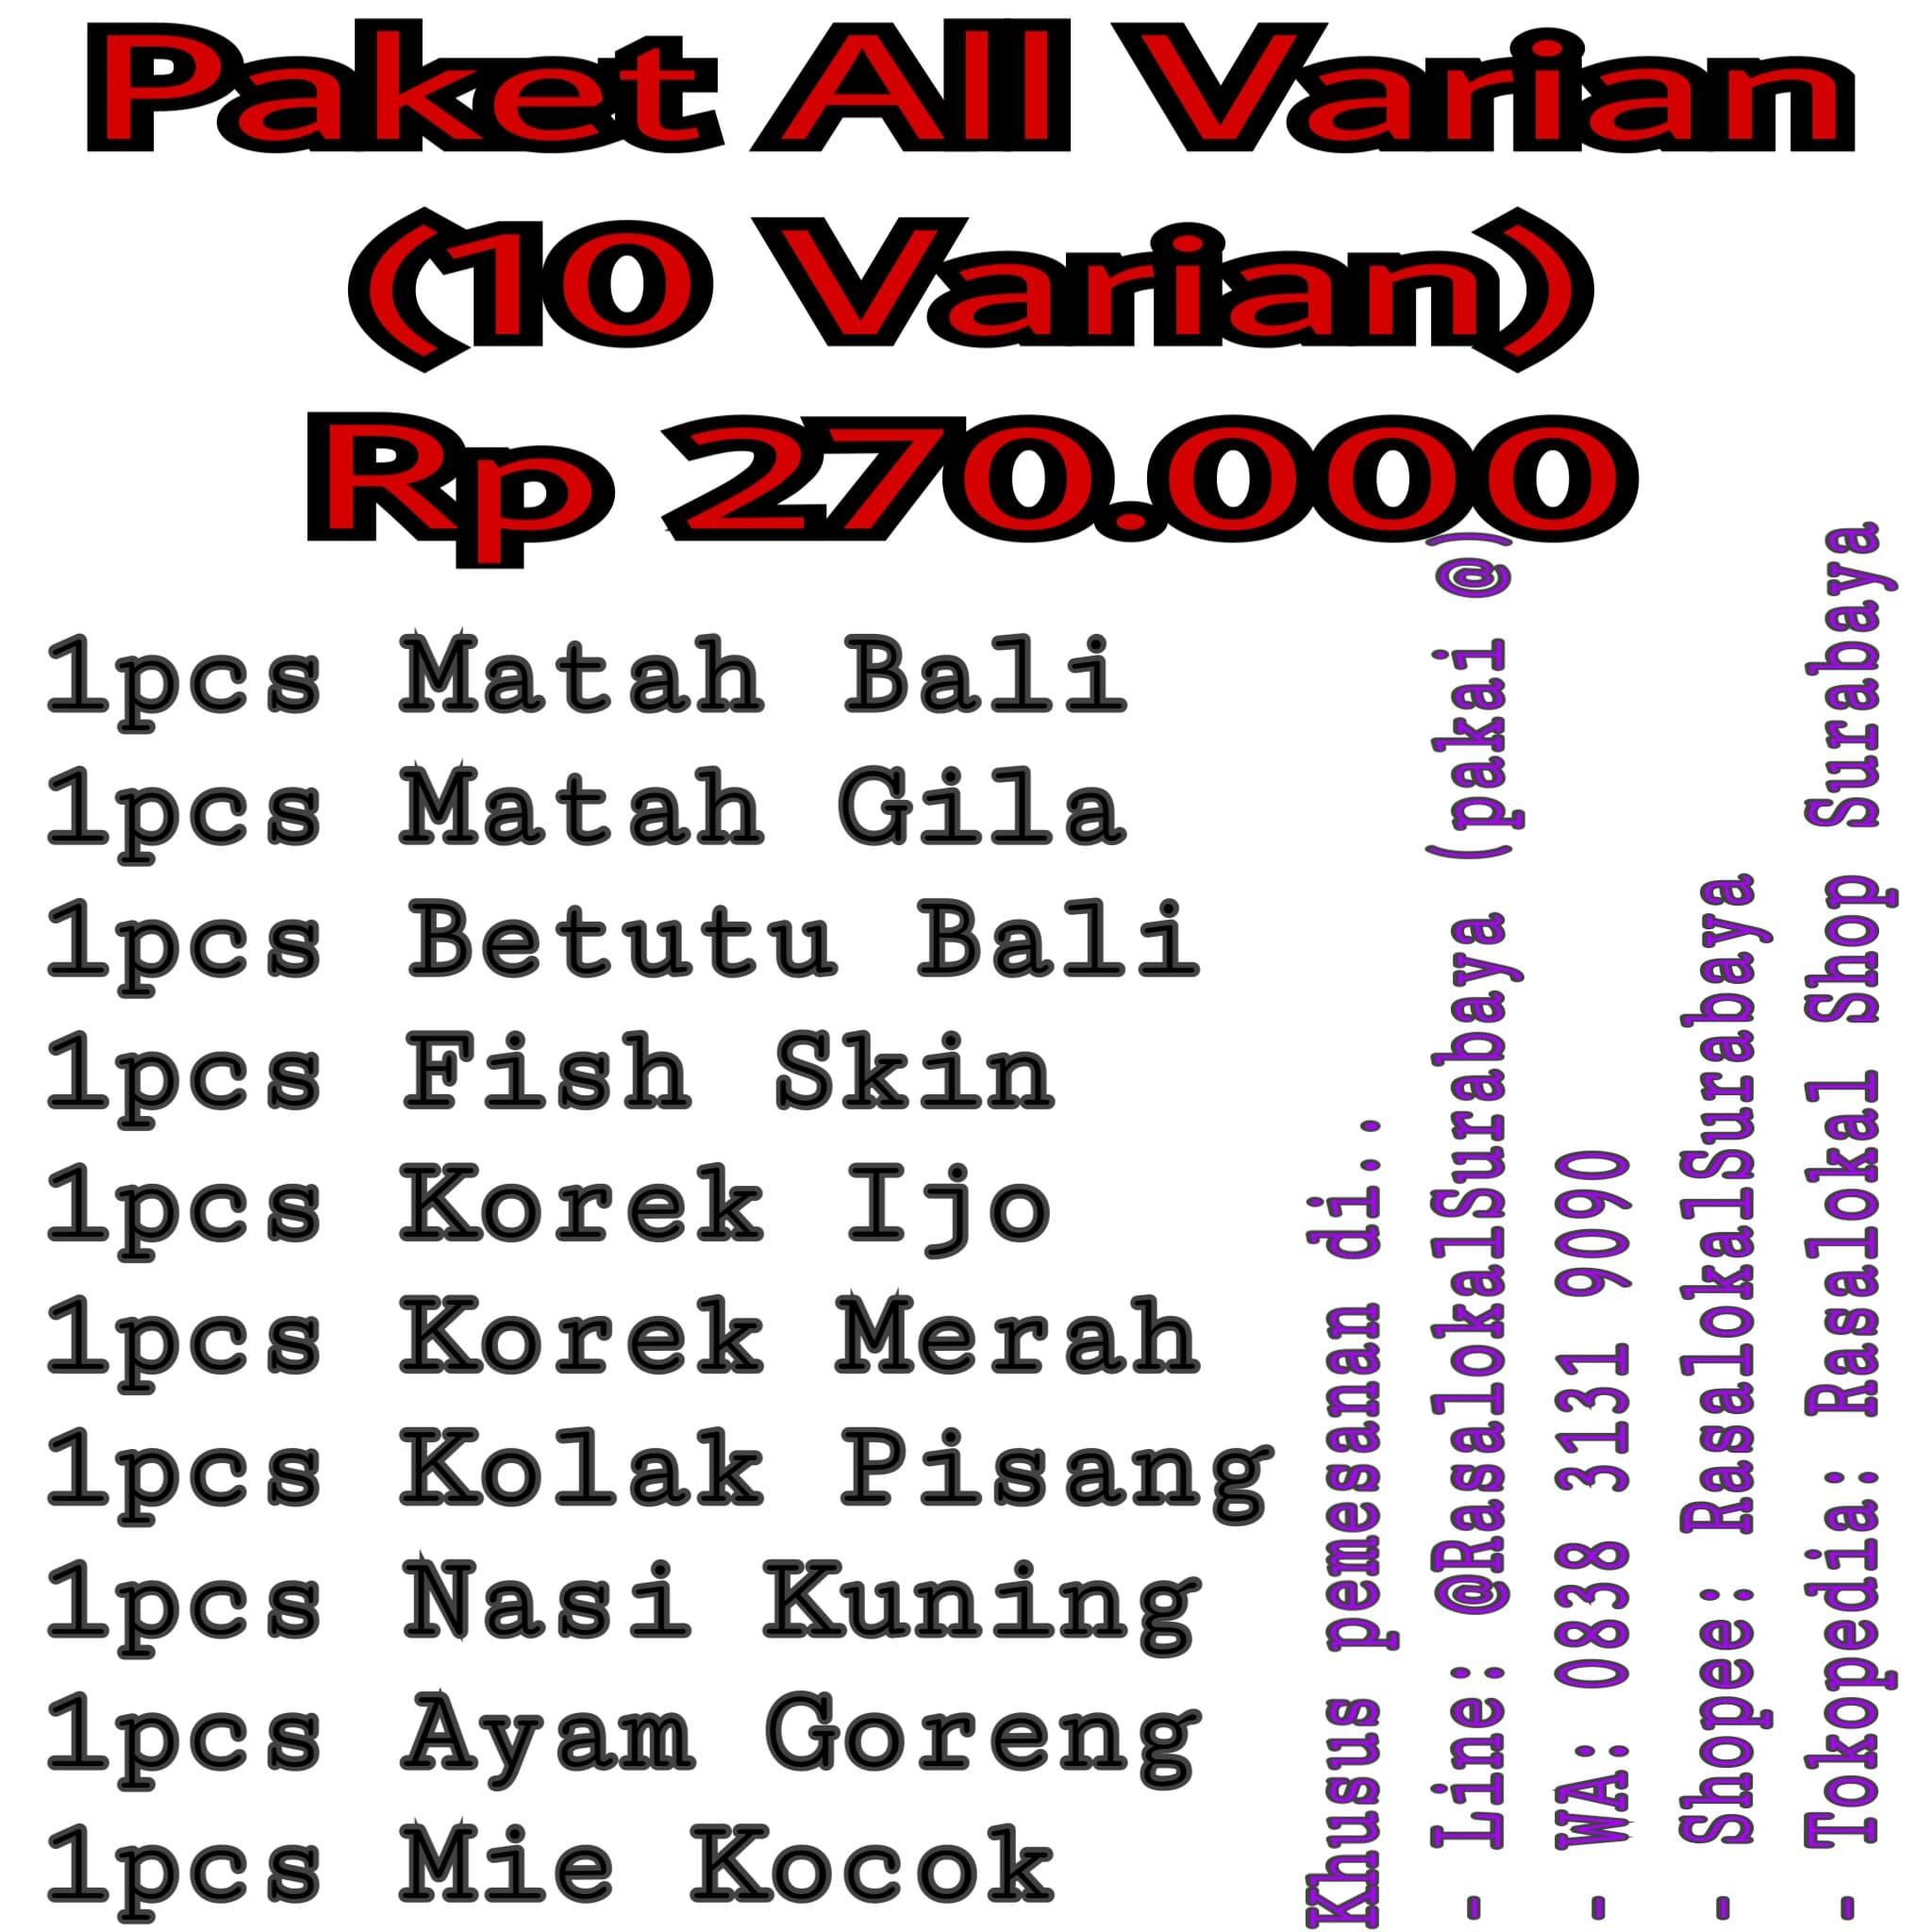 Jual Rasalokal Paket All Varian Shop Surabaya Tokopedia Korek Merah